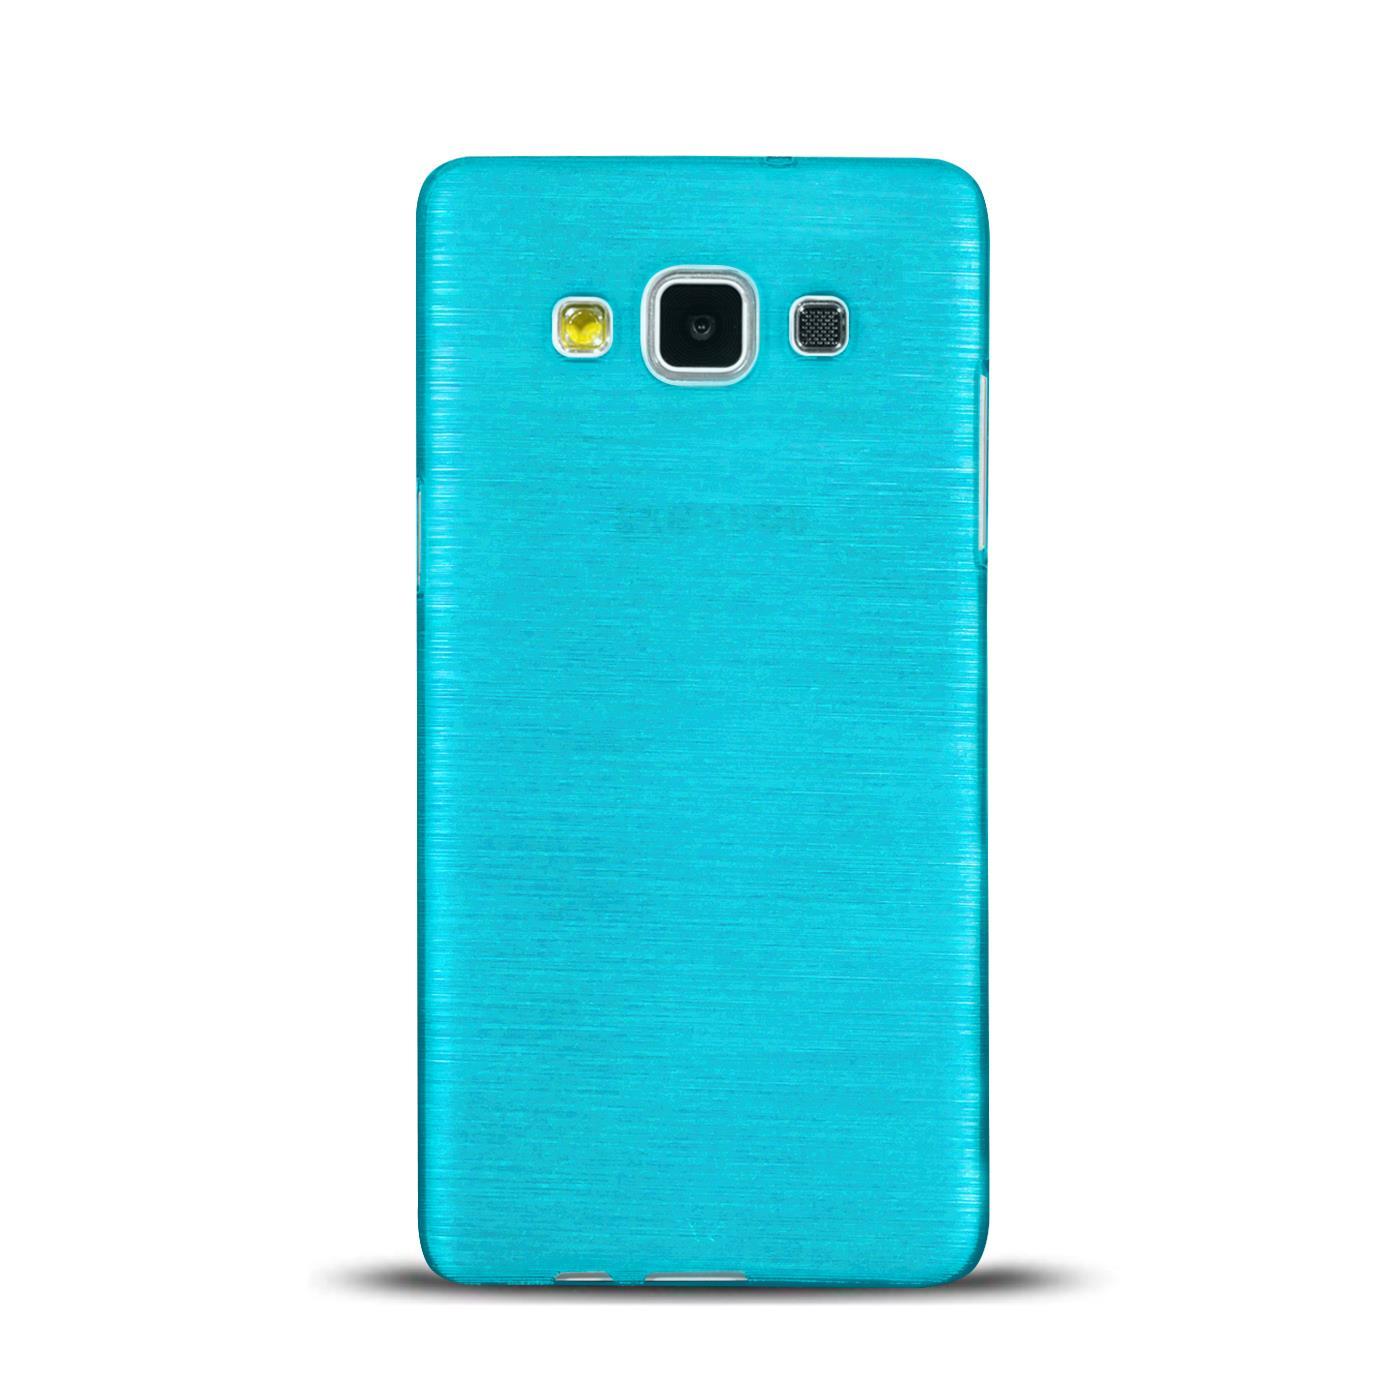 Silikon-Bumper-Case-Samsung-Galaxy-a5-2015-Ultra-Slim-Stossfeste-Rueckschale Indexbild 6